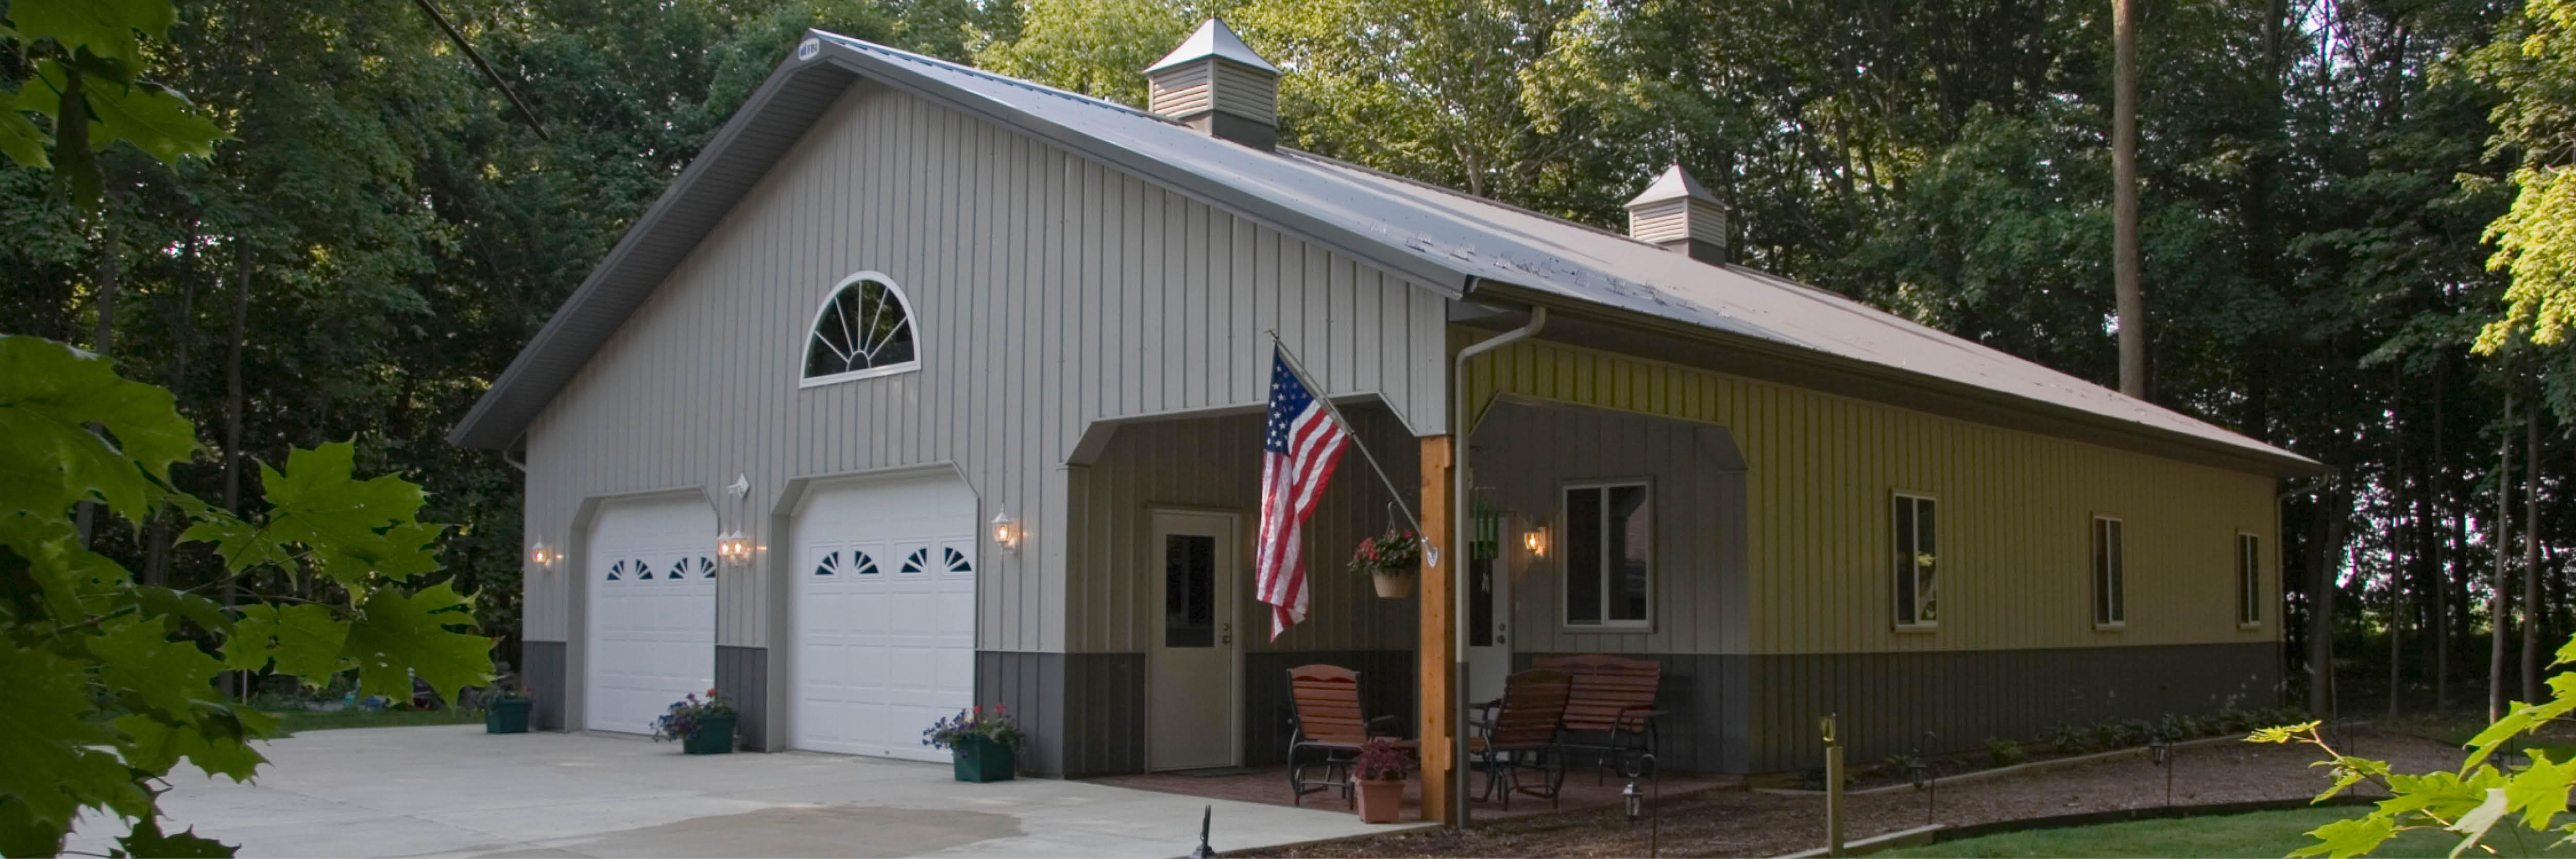 Can I Still Obtain My Pole Barn Permit During COVID-19?